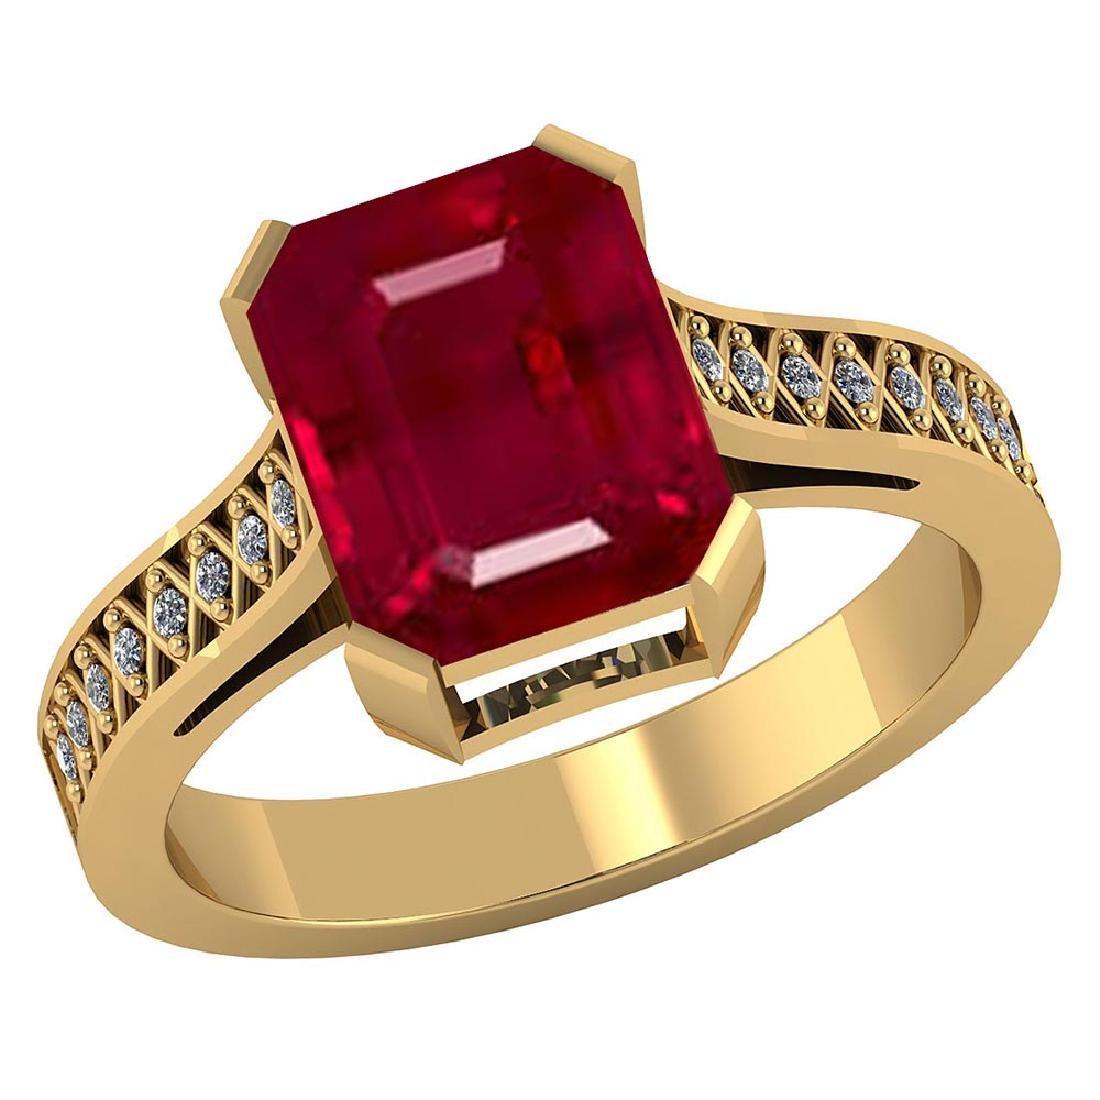 Certified 2.90 CTW Genuine Ruby And Diamond 14K Yellow